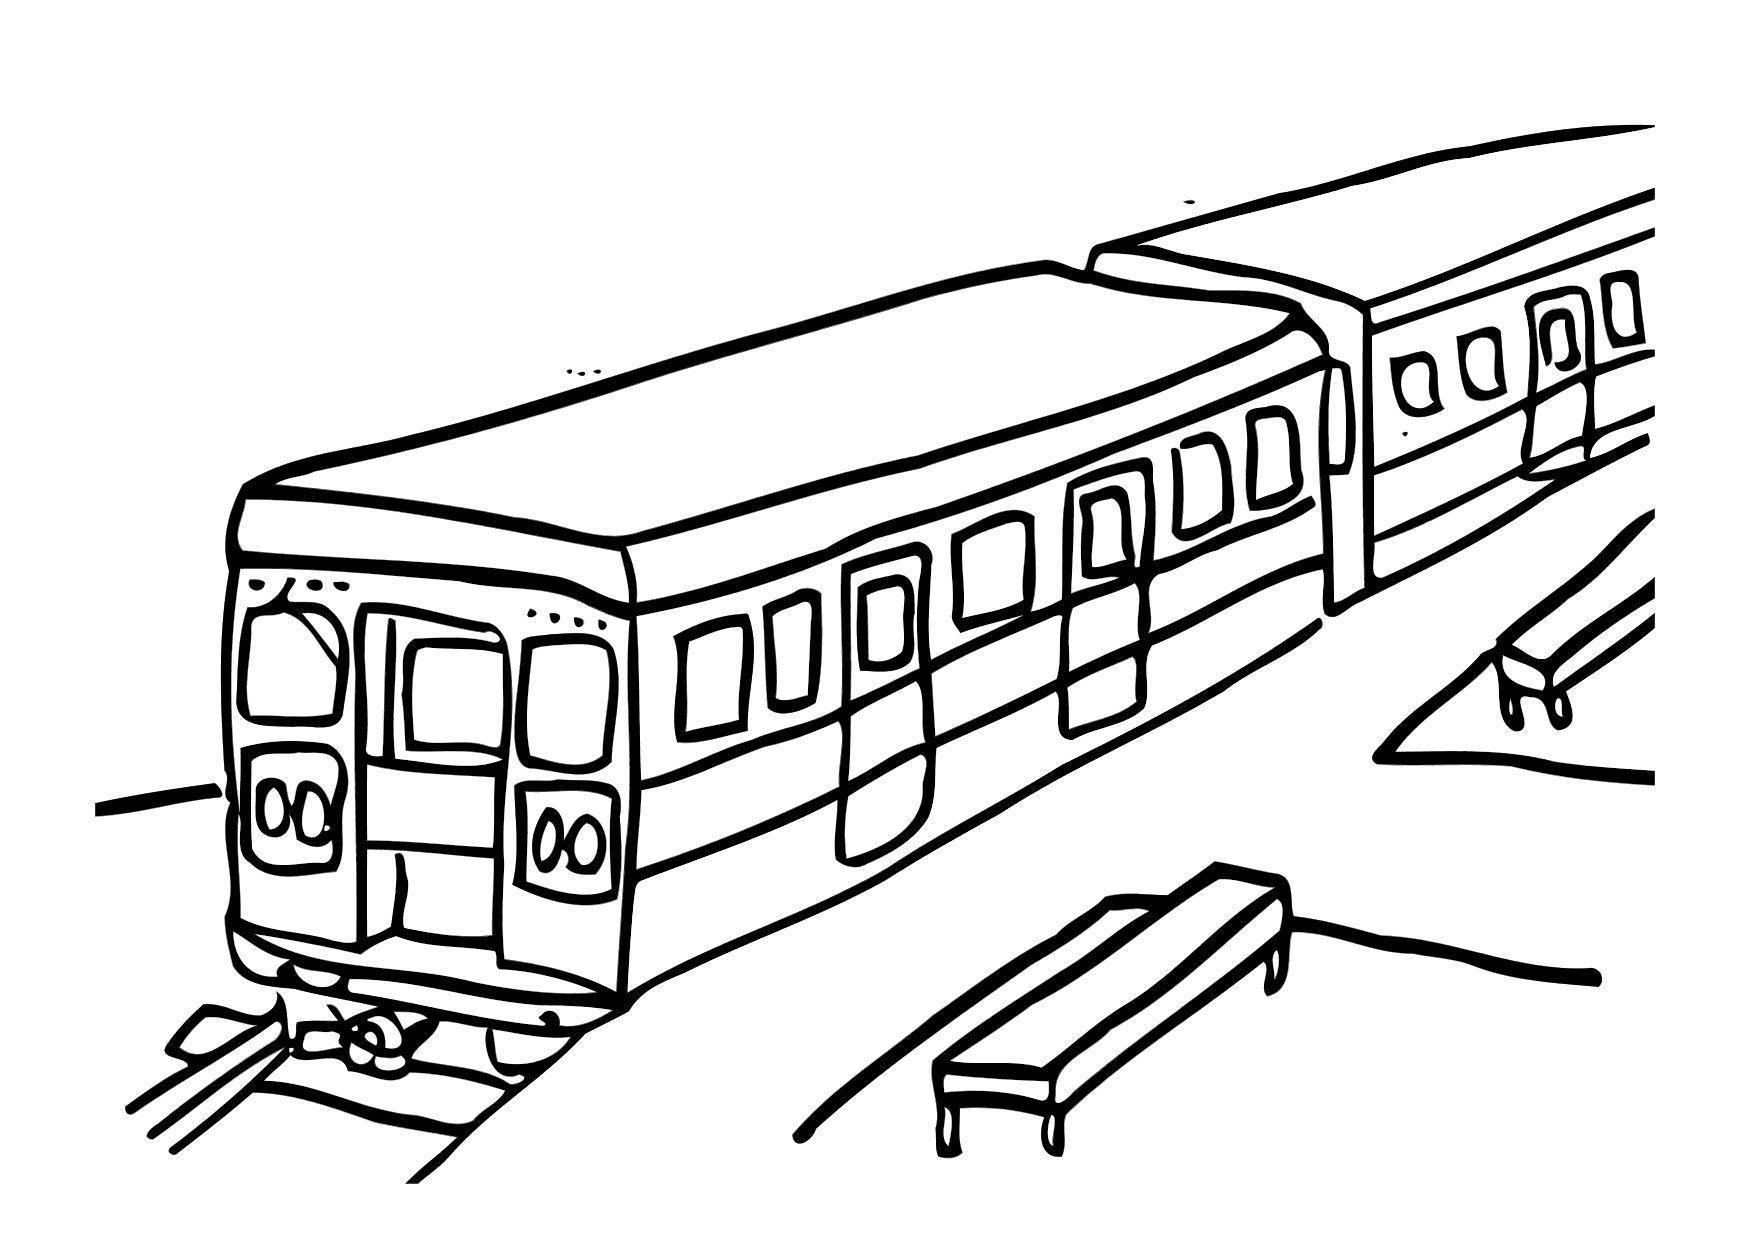 Dibujo para colorear Tren - Img 12303